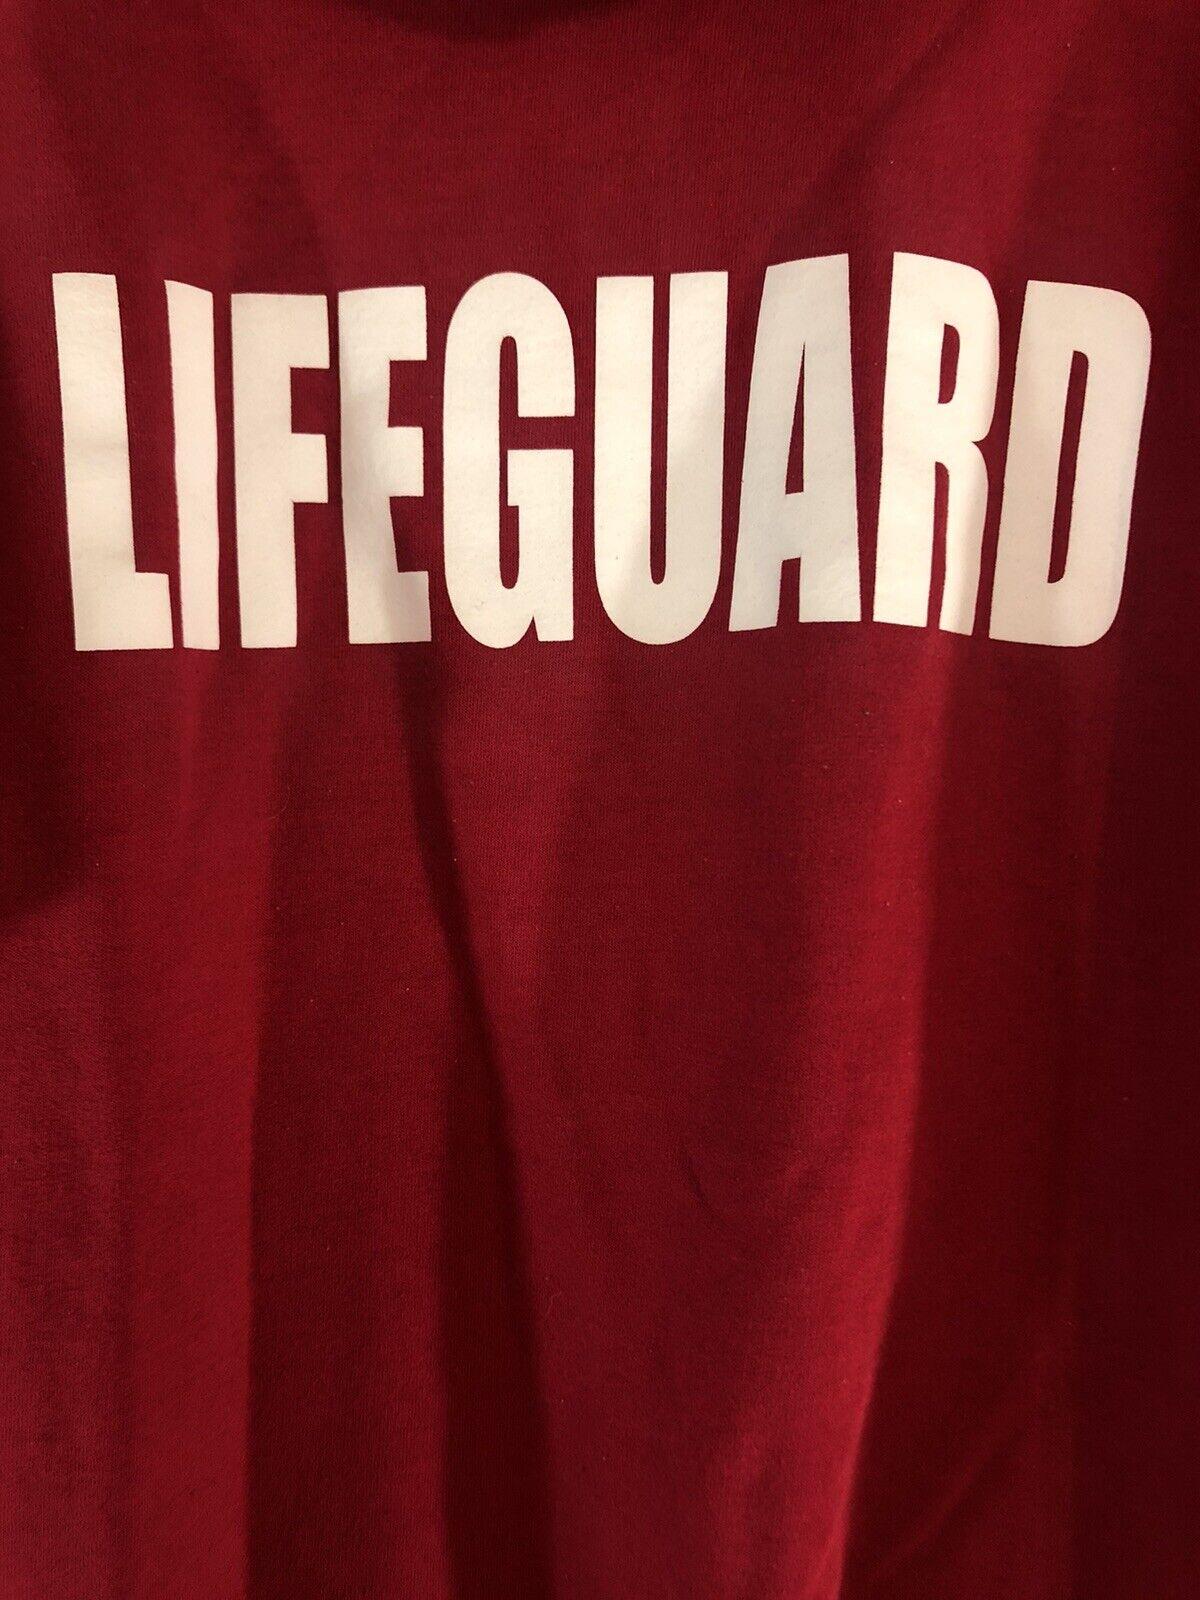 """KAH-NEE-TA"" Warm Springs, OR, Red Novelty Lifeguard Sweatshirt Adult XL 46-48"